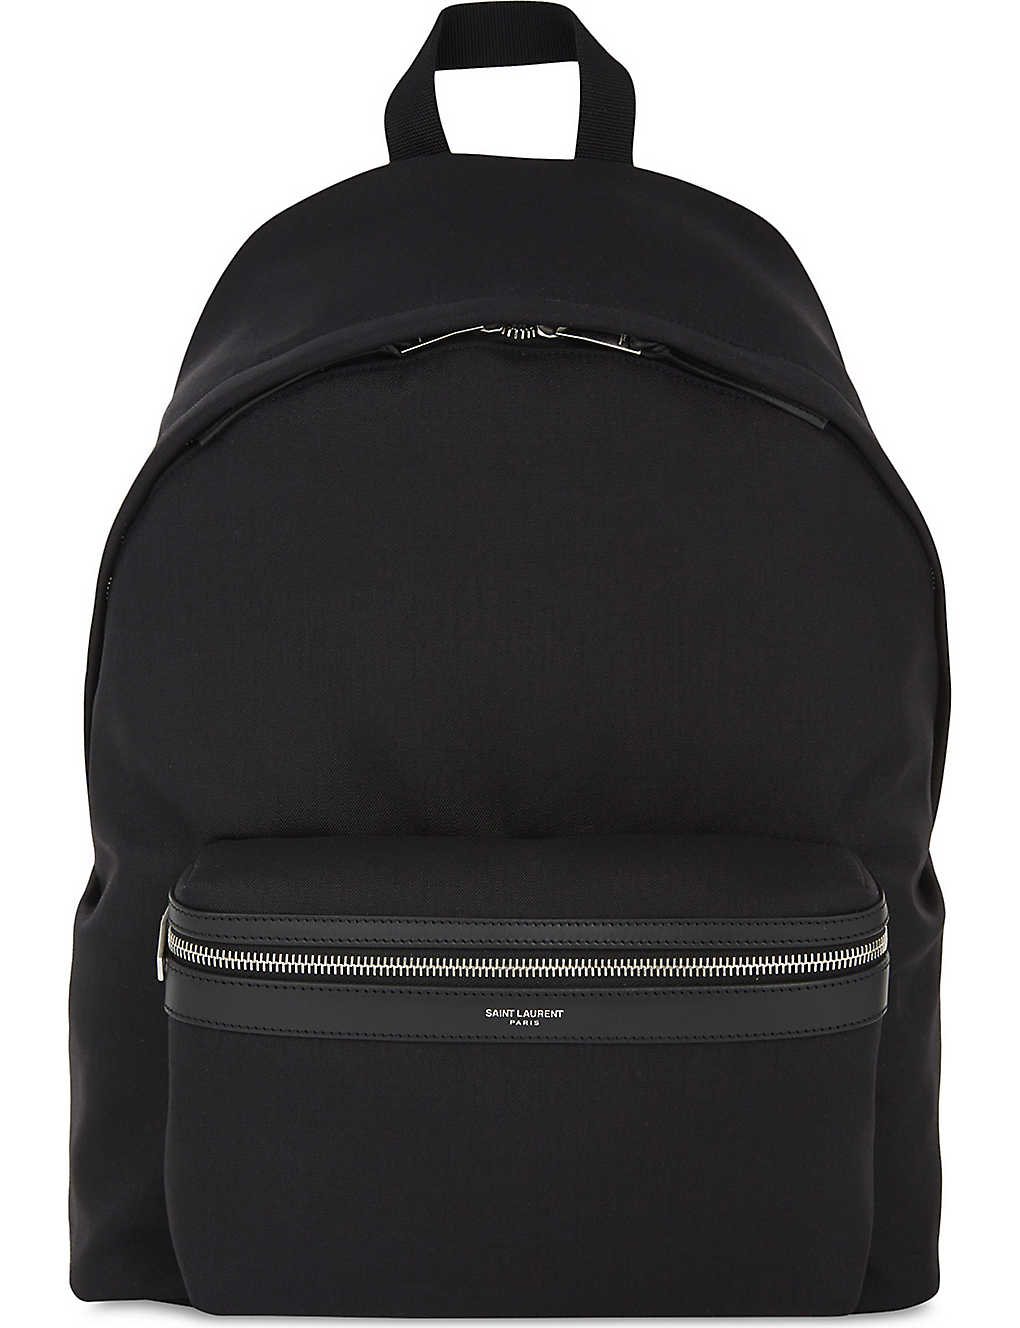 3a8a09bb022d SAINT LAURENT - City nylon backpack